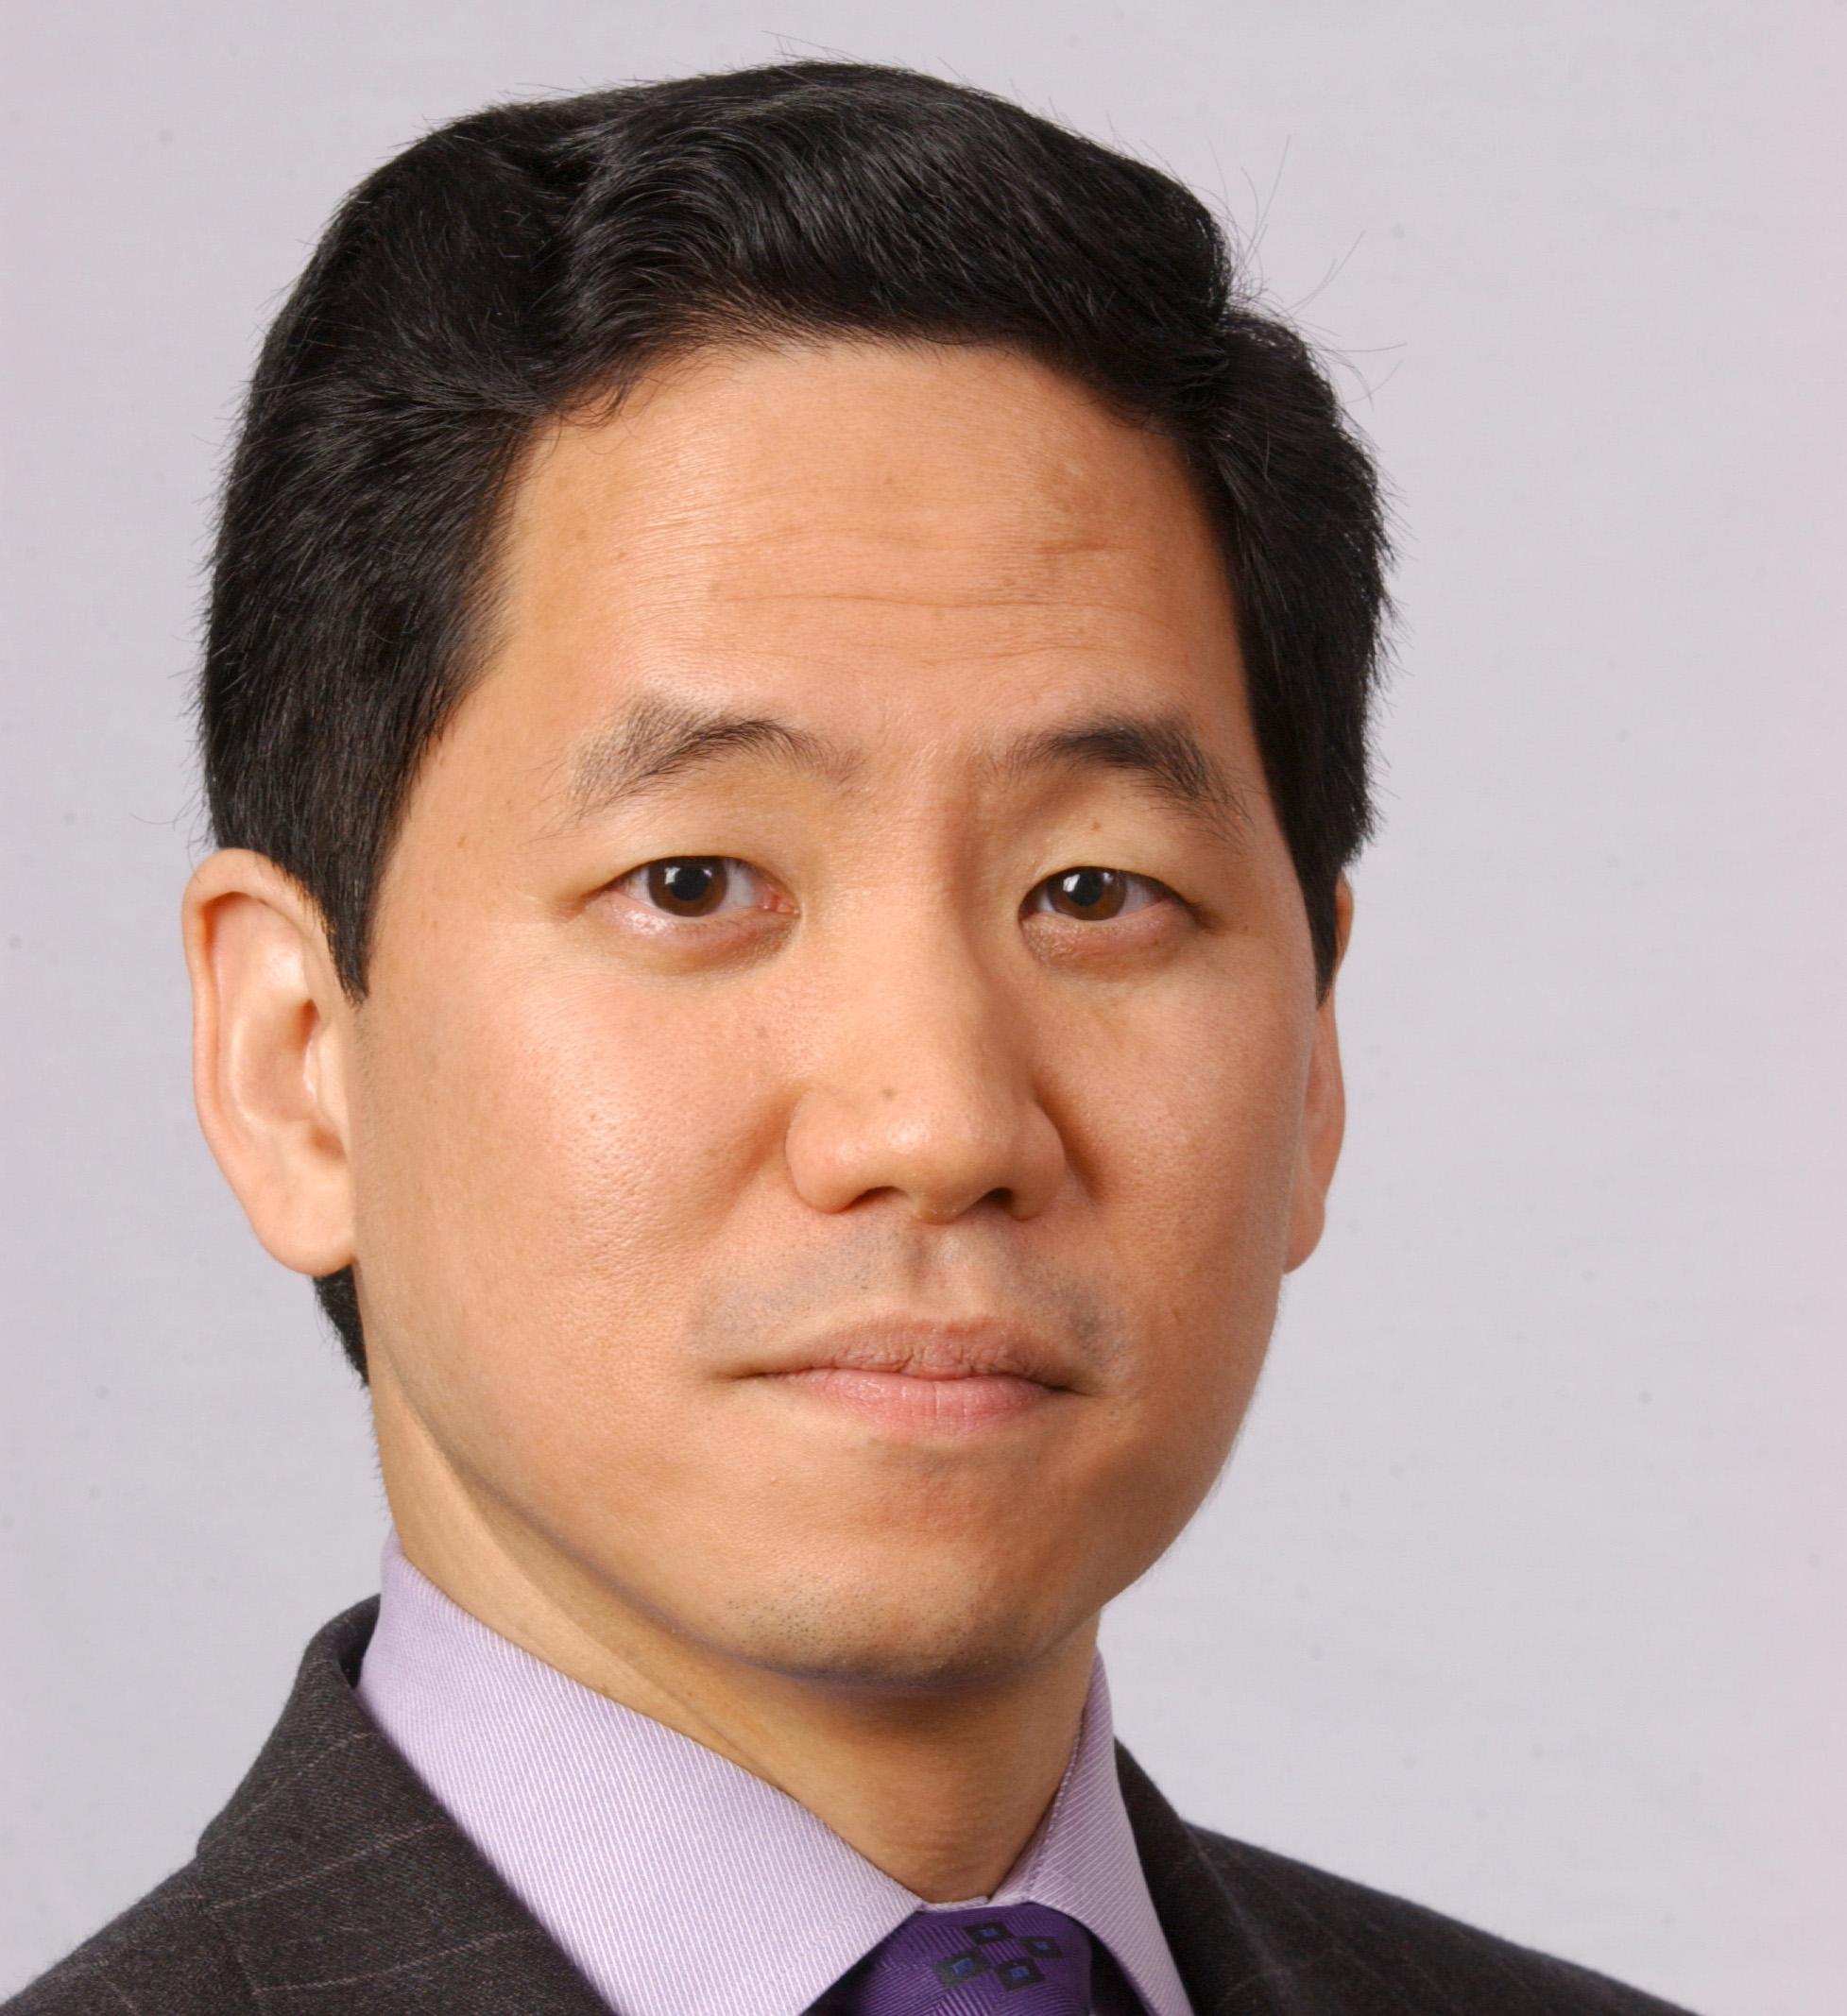 Celebration of life of Vanderbilt Law School professor Richard Nagareda scheduled